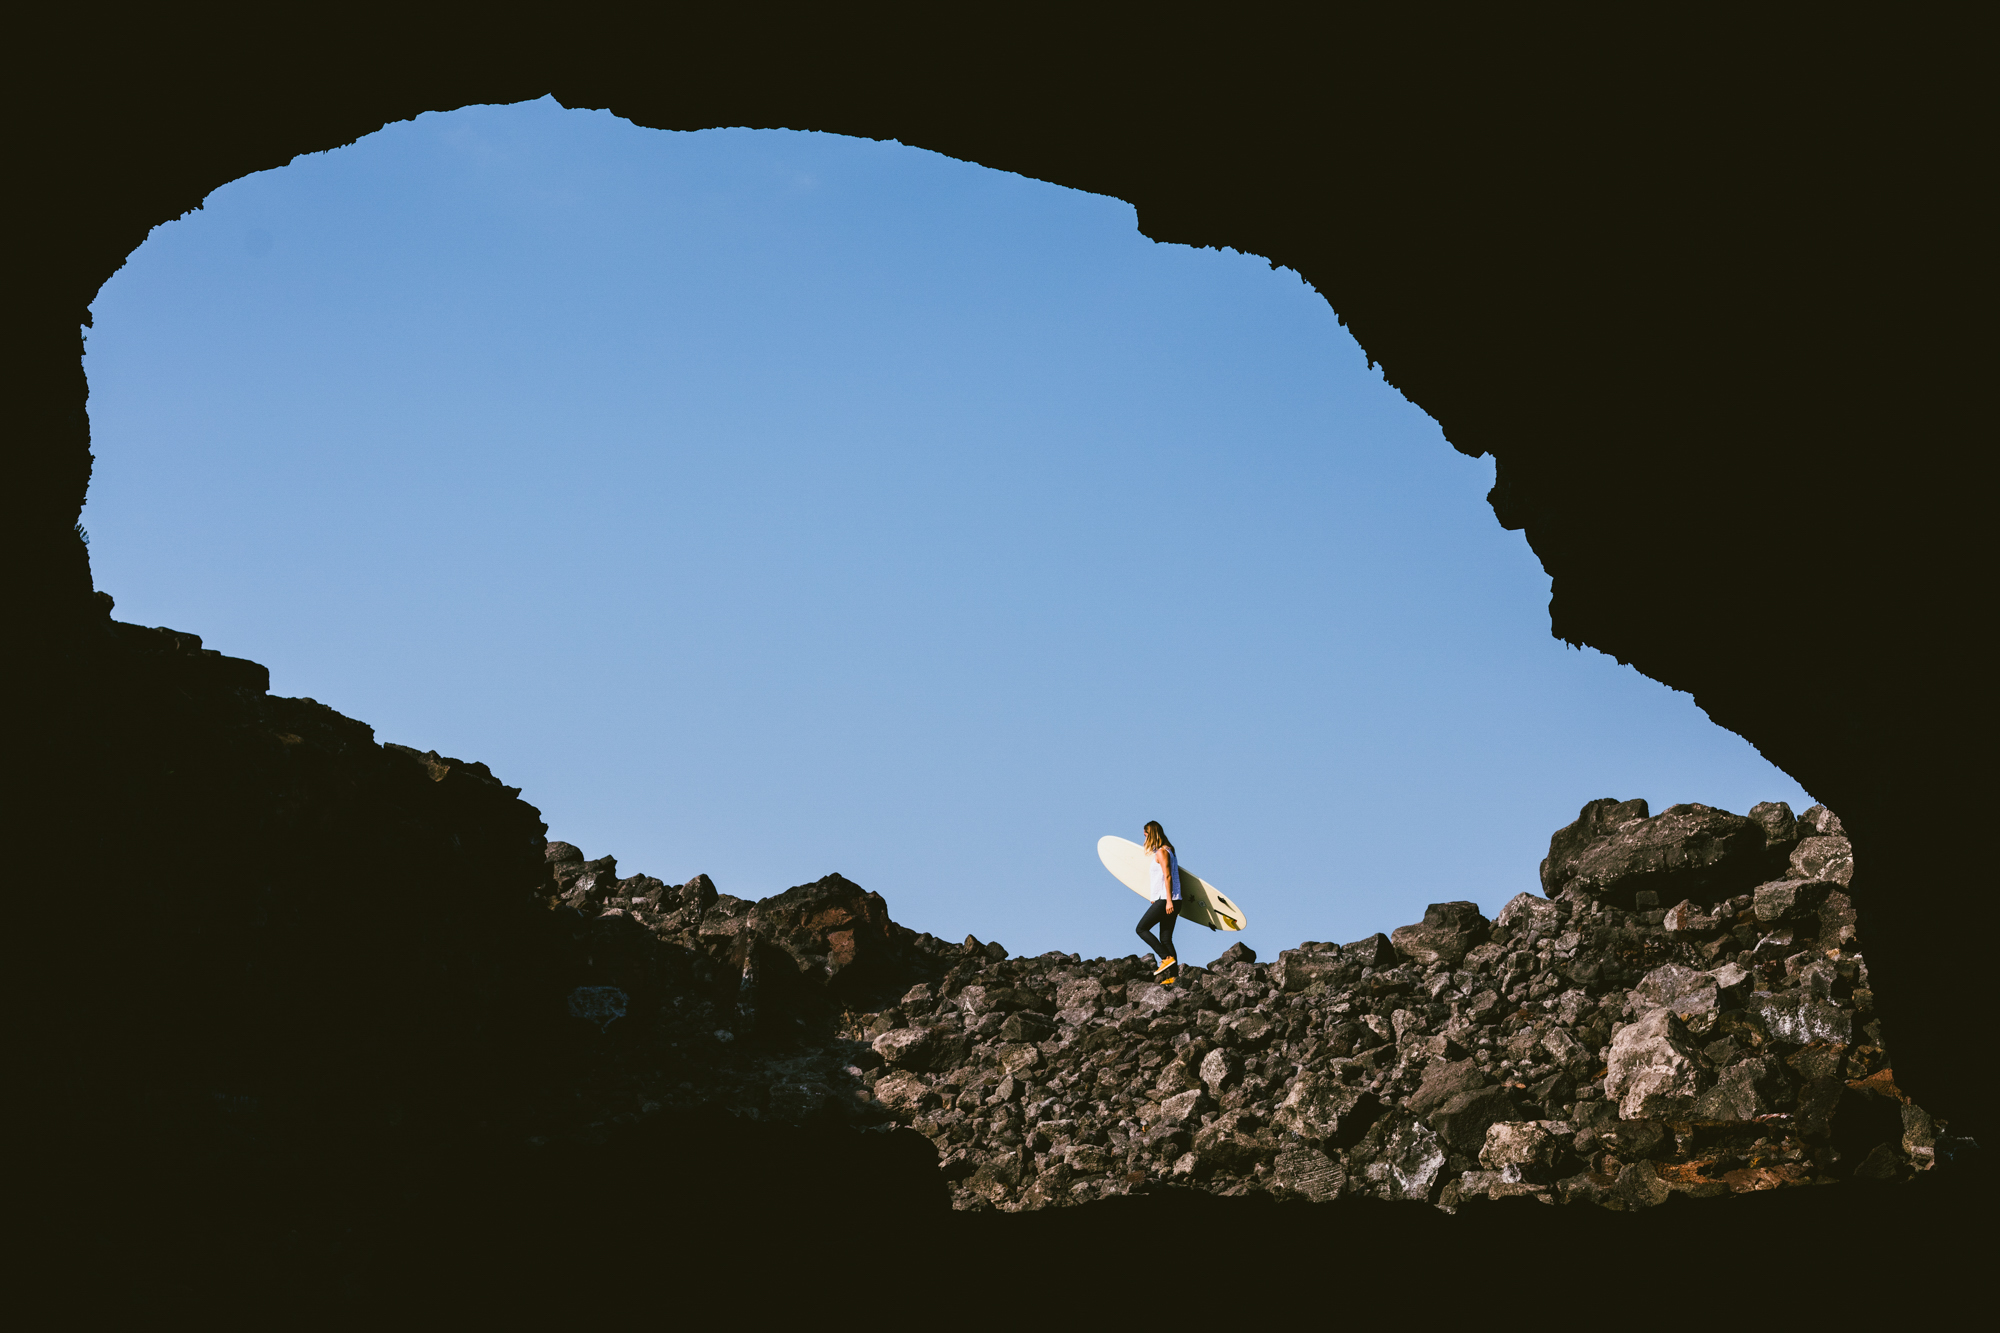 PrAna athlete-amabassador, Anna Ehrgott on the Big Island of Hawaii.